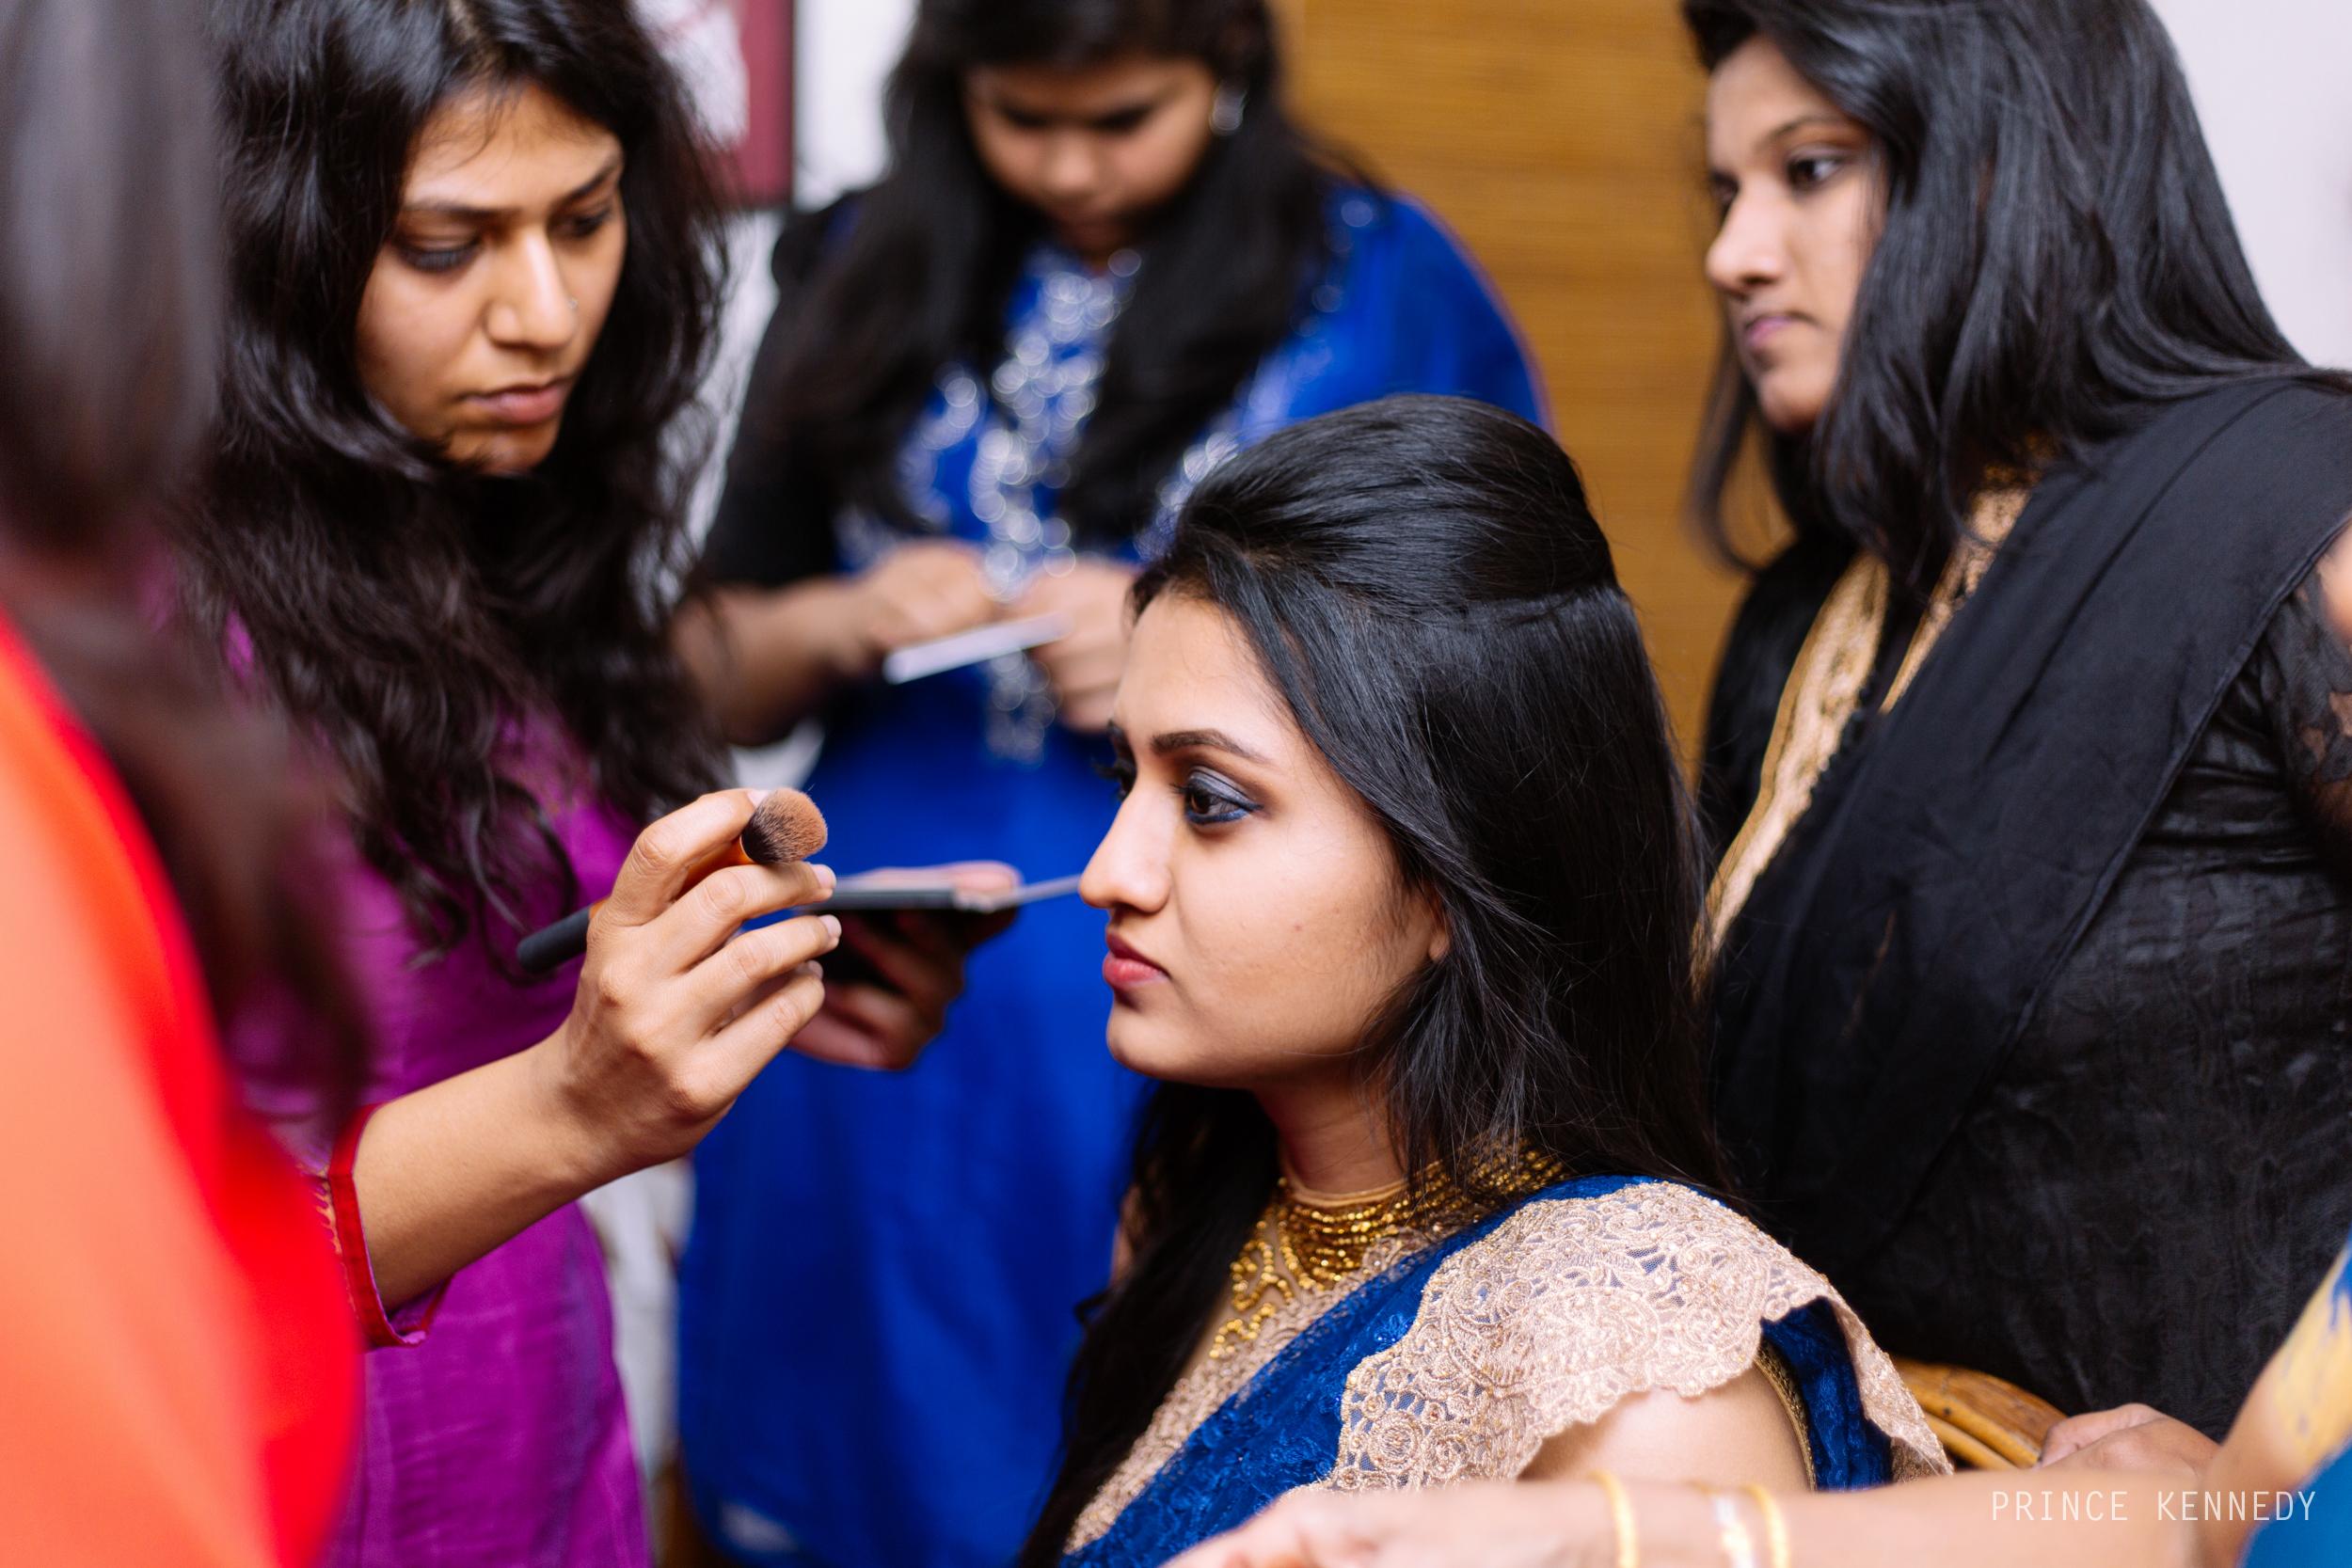 Athmajja-Nithesh-Engagement-Couple-Portrait-Portraiture-Wedding-Couple-Portrait-Chennai-Photographer-Candid-Photography-Destination-Best-Prince-Kennedy-Photography-12.jpg